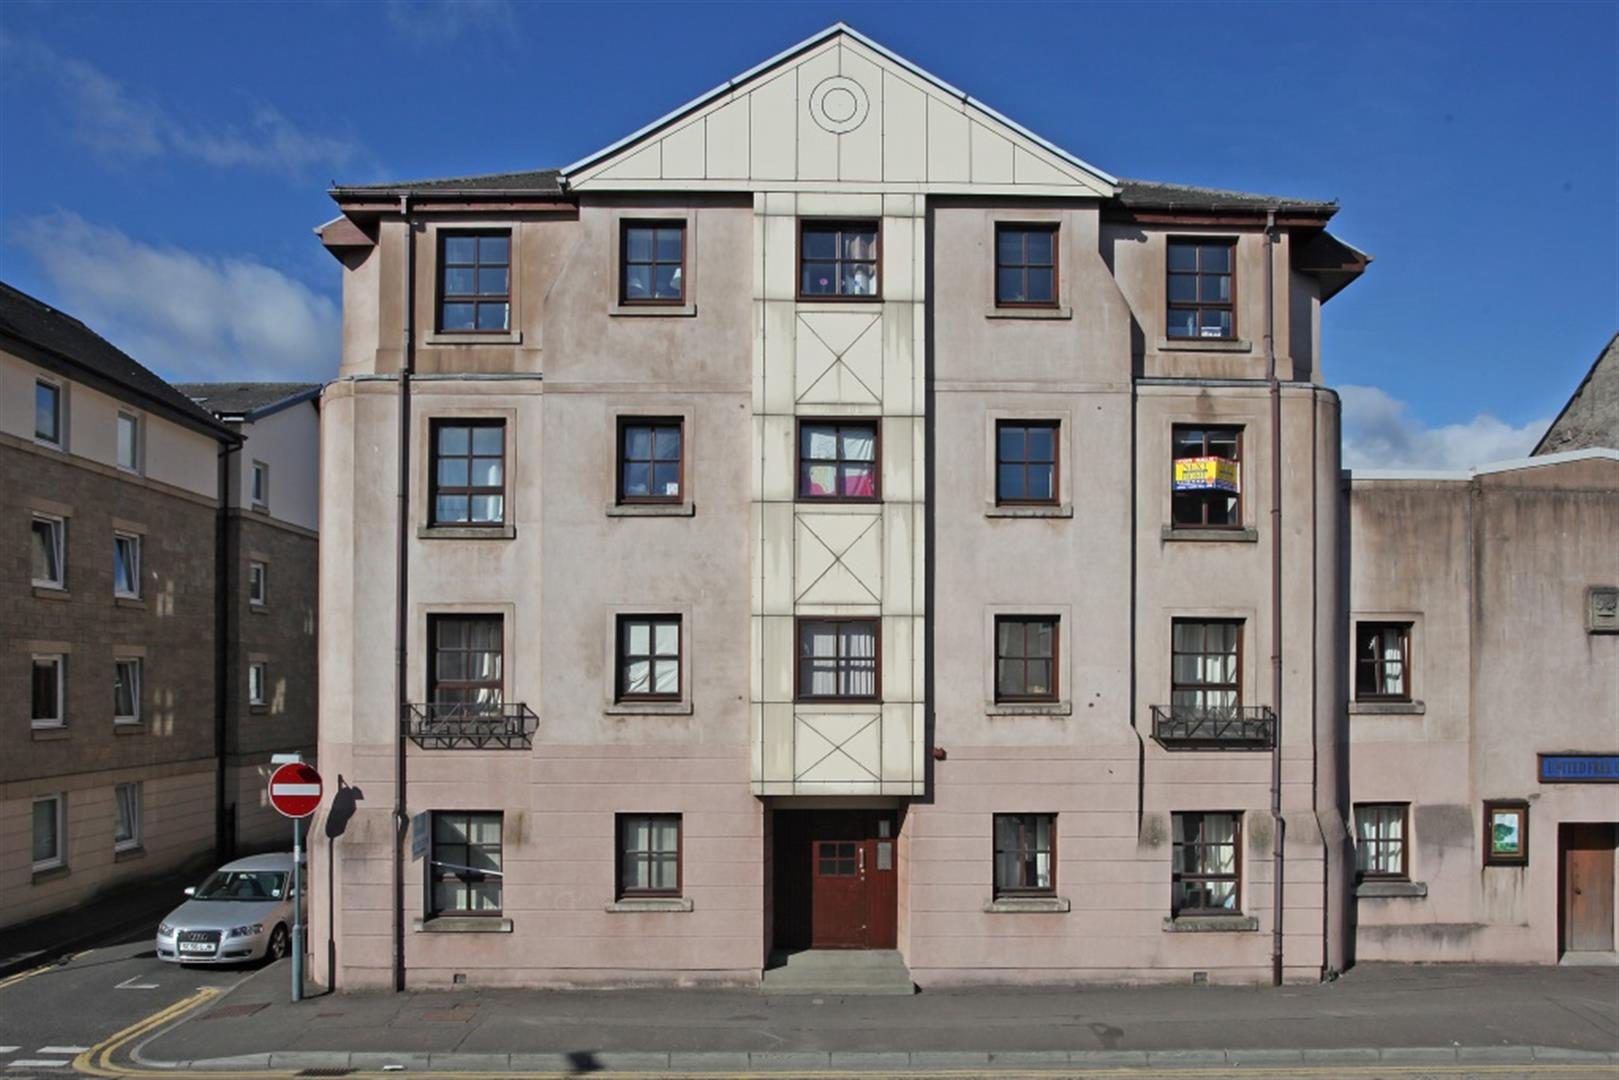 11 The Cooperage, 44, Kinnoull Street, Perth, Perthshire, PH1 5EQ, UK